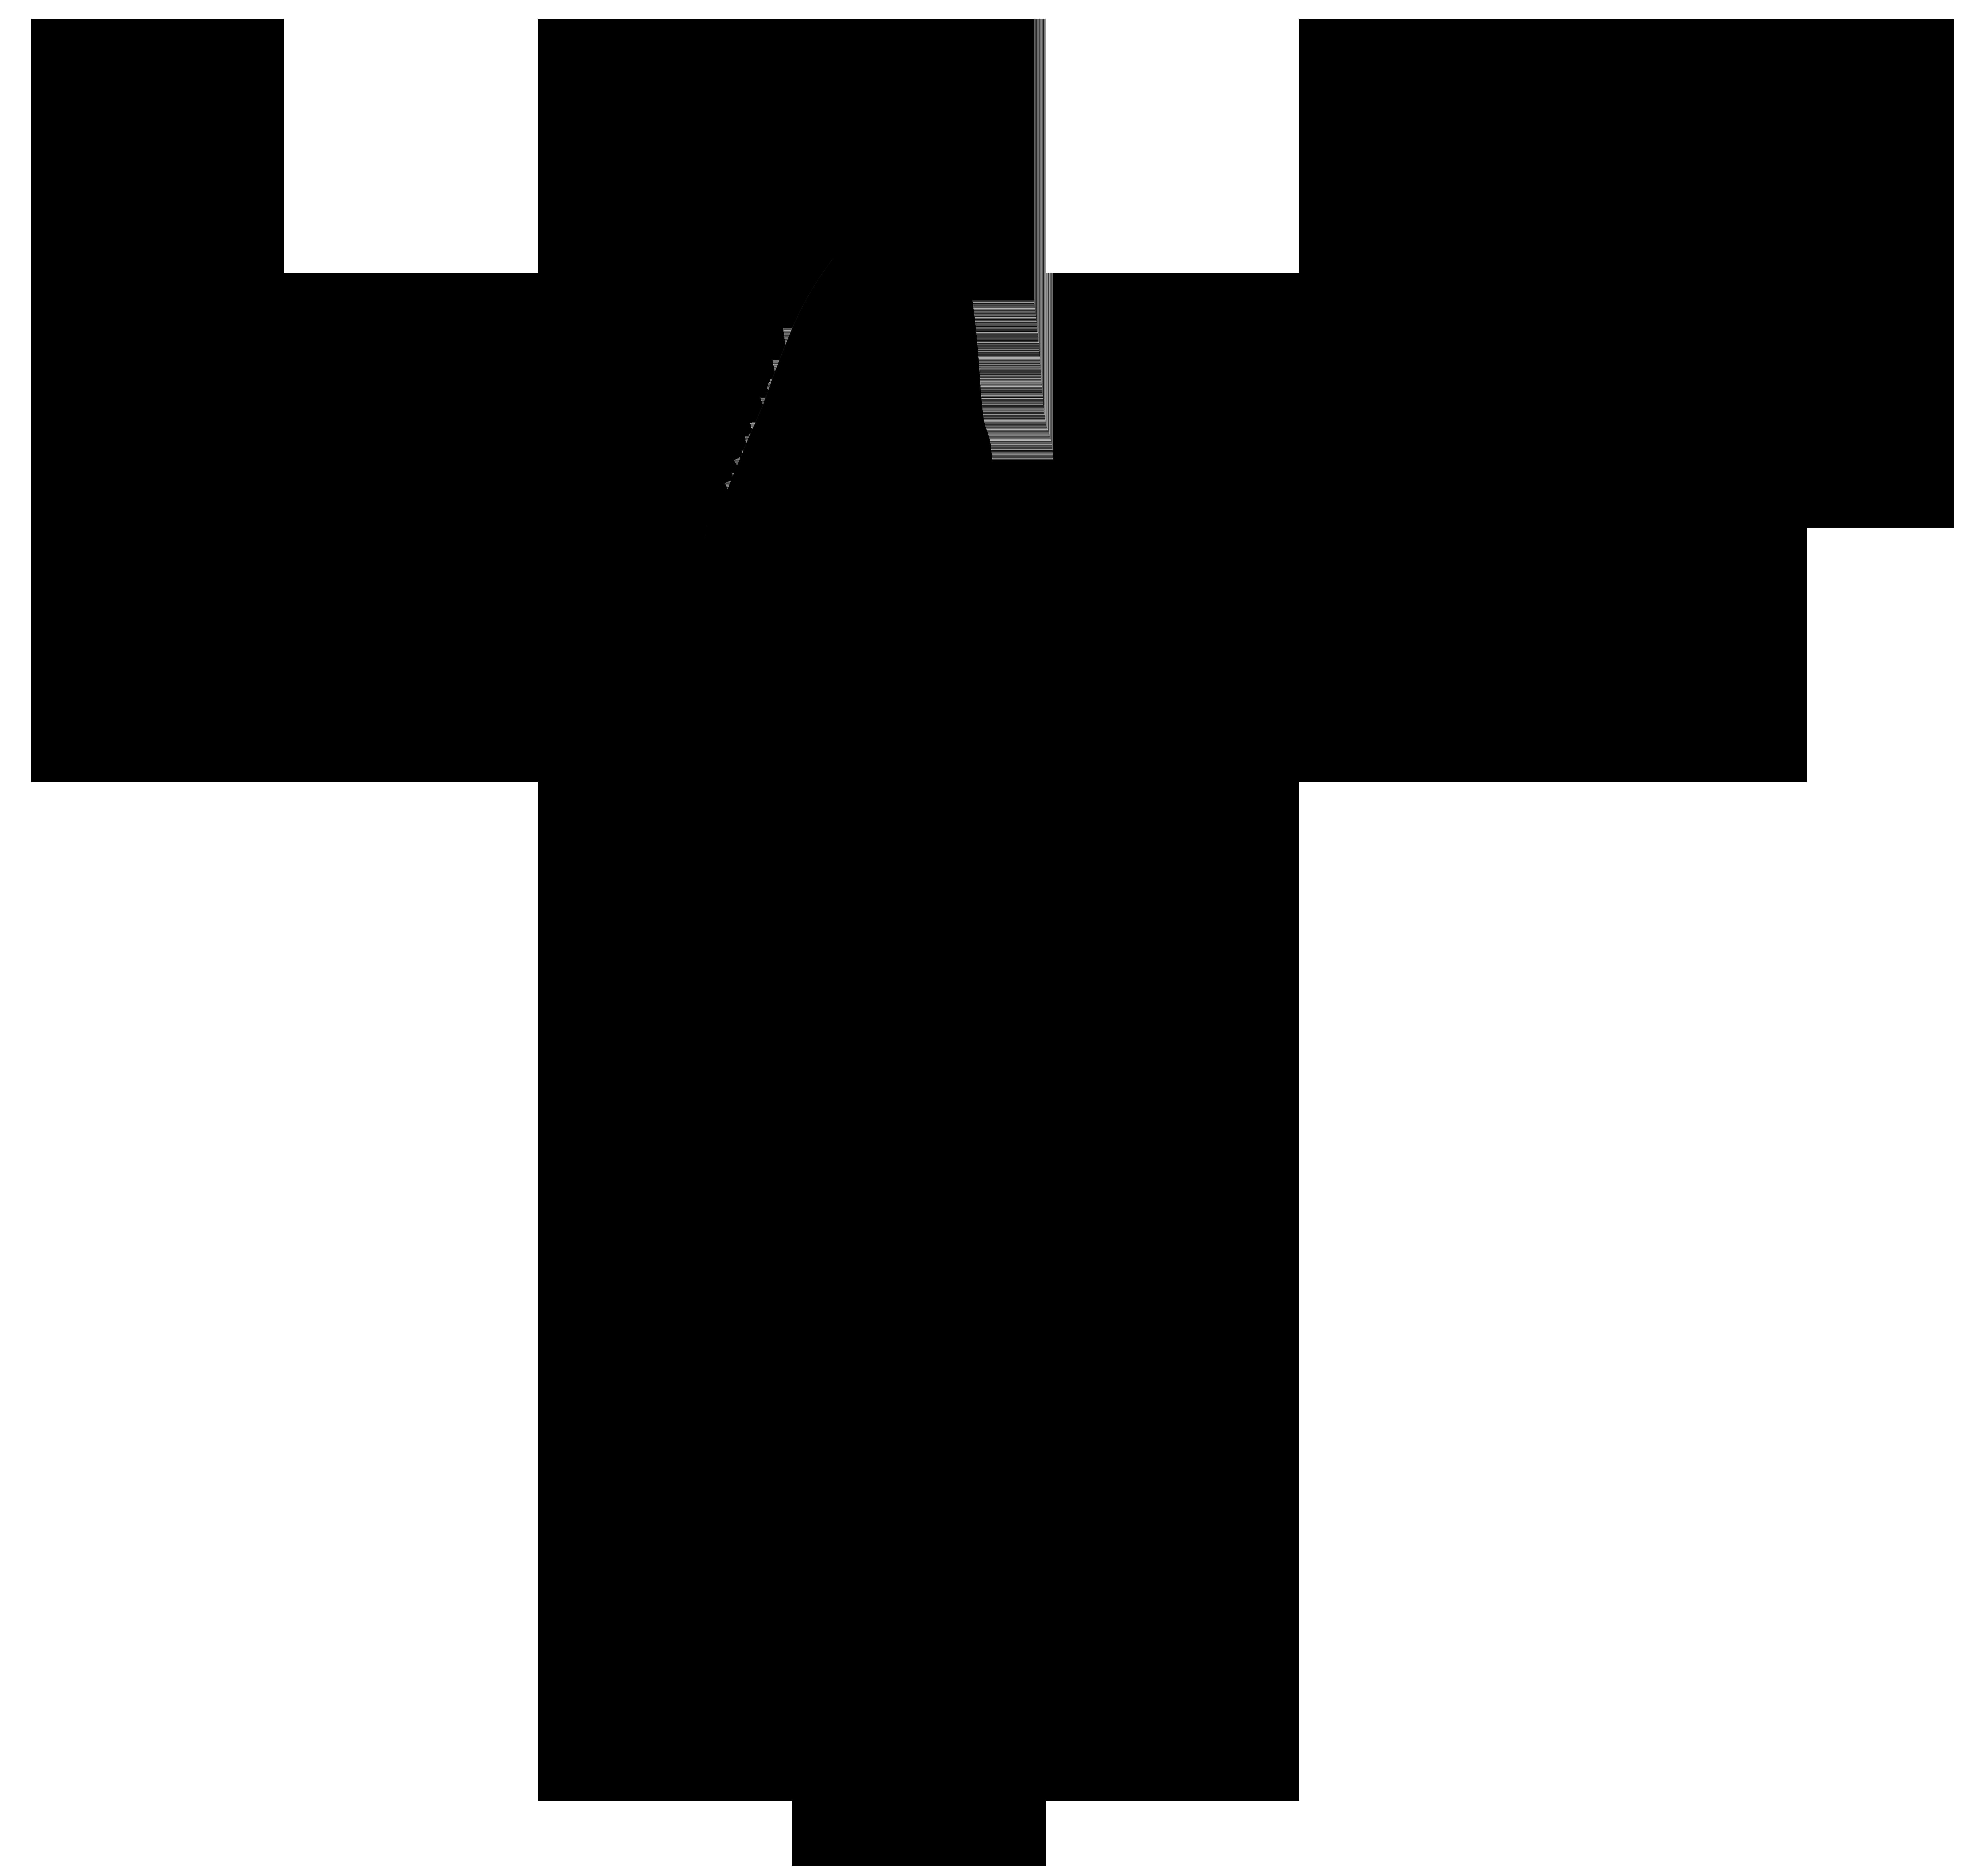 8000x7574 Fairy Silhouette Png Transparent Clip Art Imageu200b Gallery